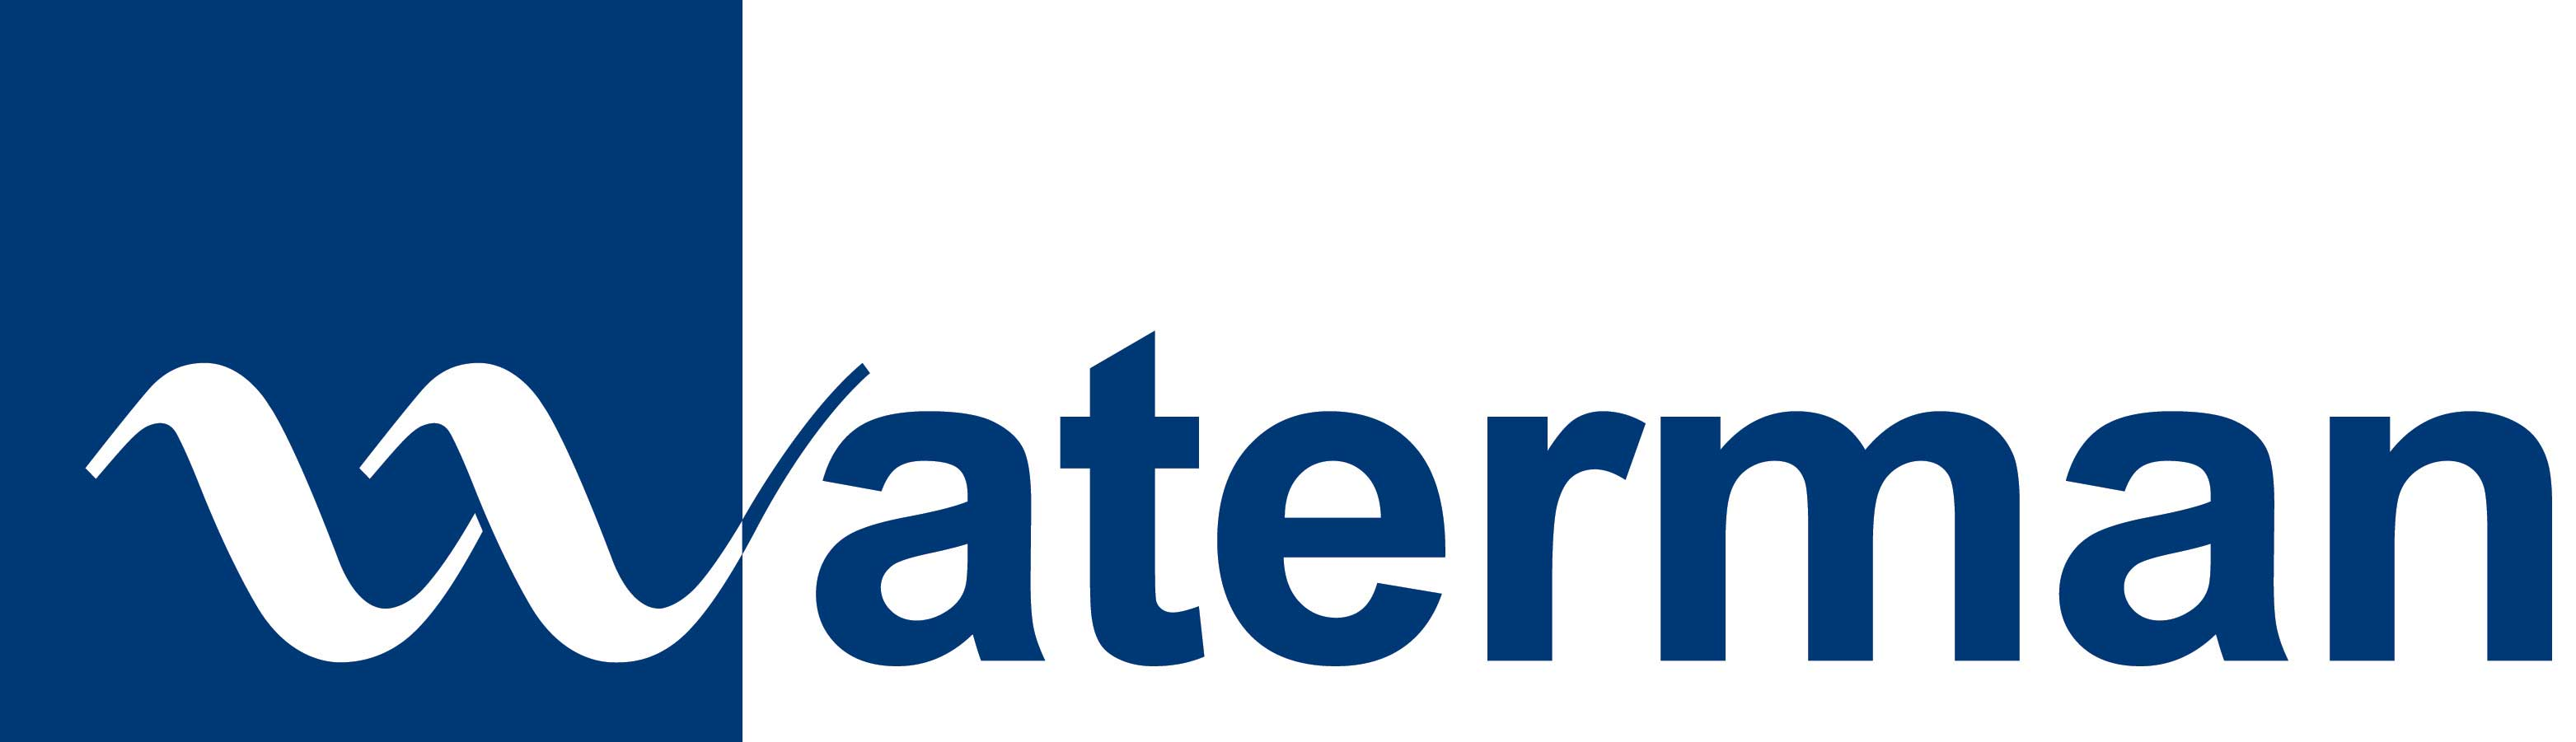 Image Logo Waterman Group Partner Sponsor